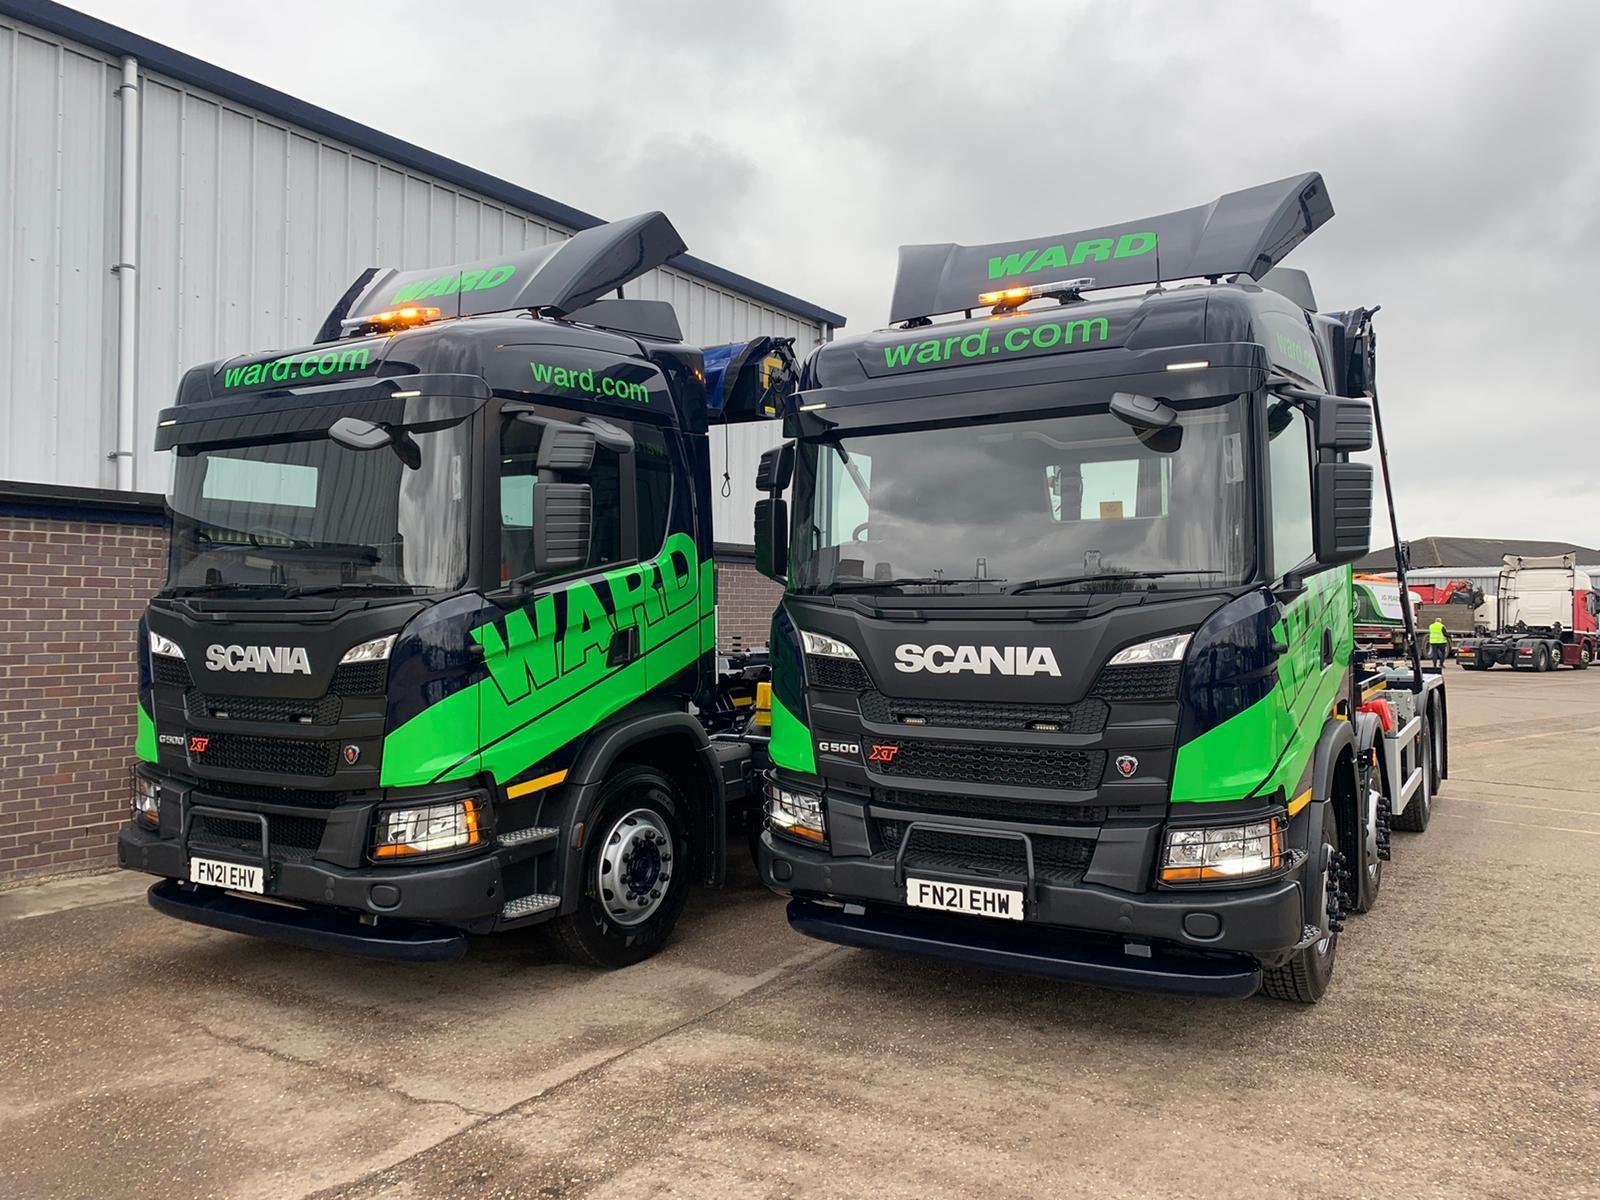 Ward invests £2million in green upgrade to vehicle fleet